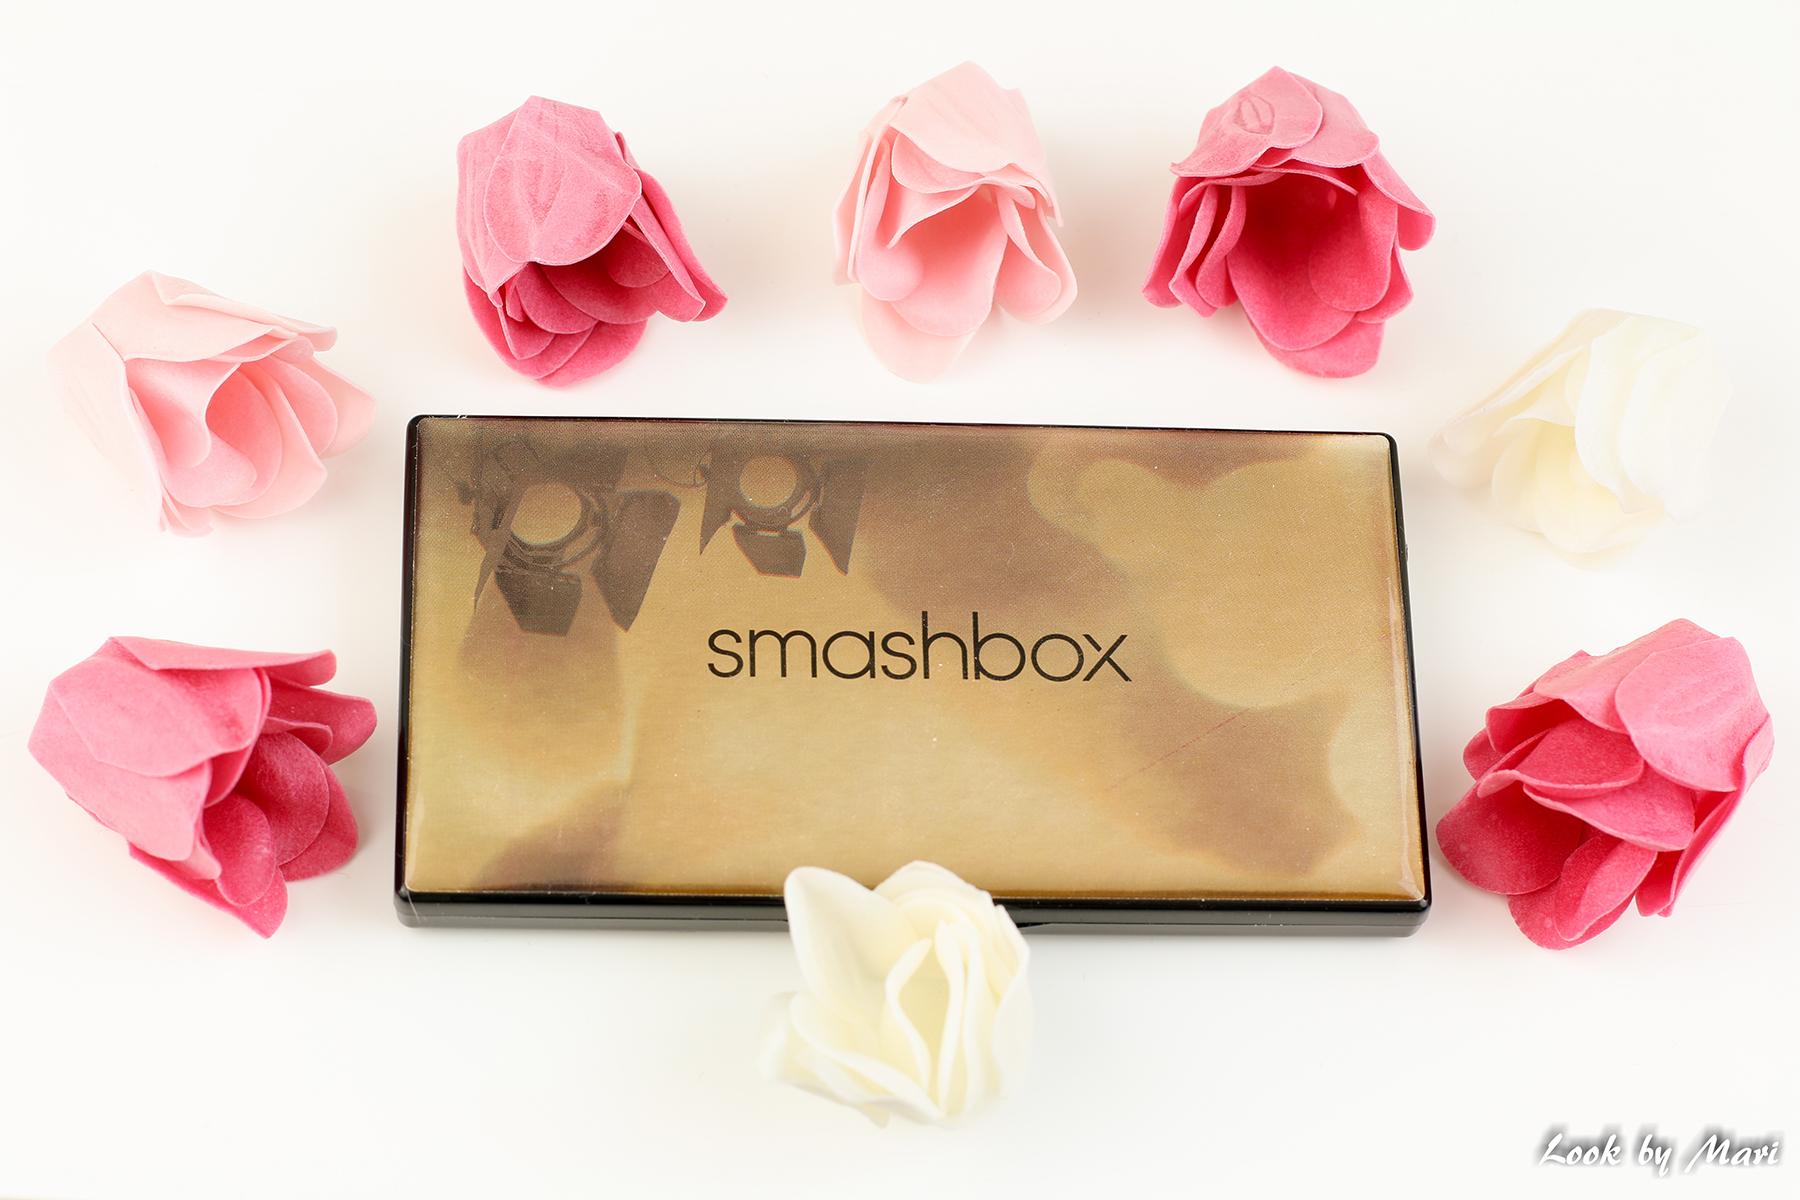 5 smashbox x casey holmes spotlight palette pearl review kokemuksia swatches